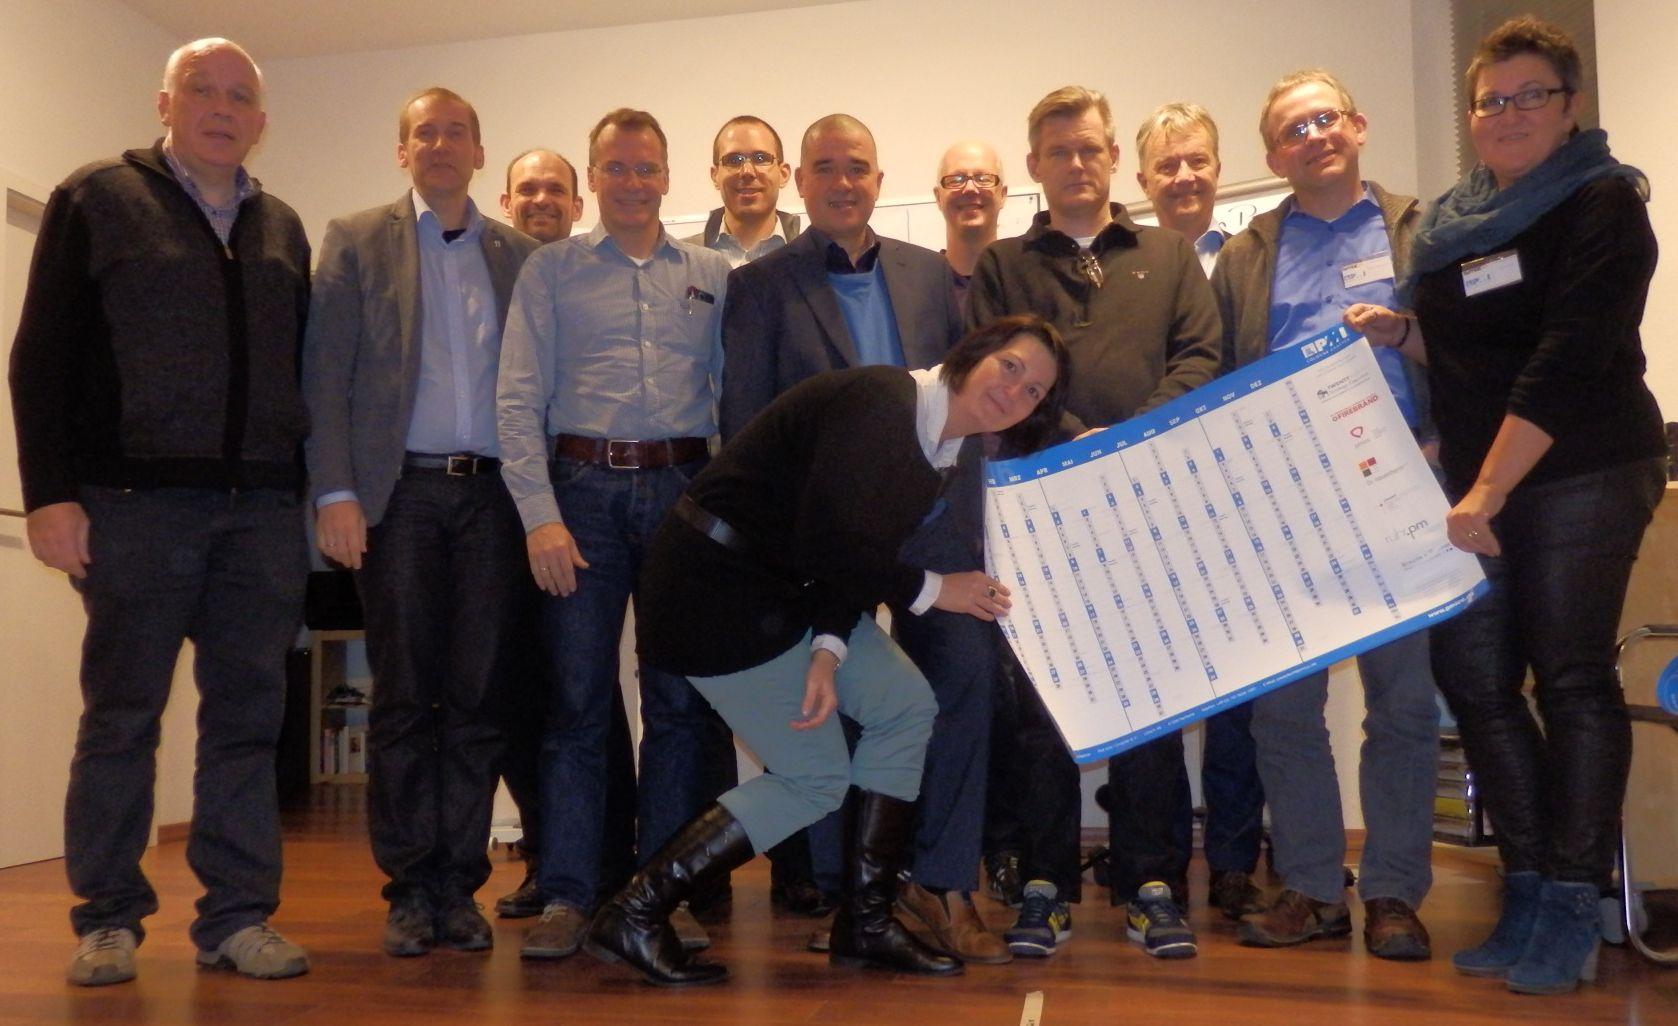 Rückblick Workshop vom 21. Nov. 2015 in Köln